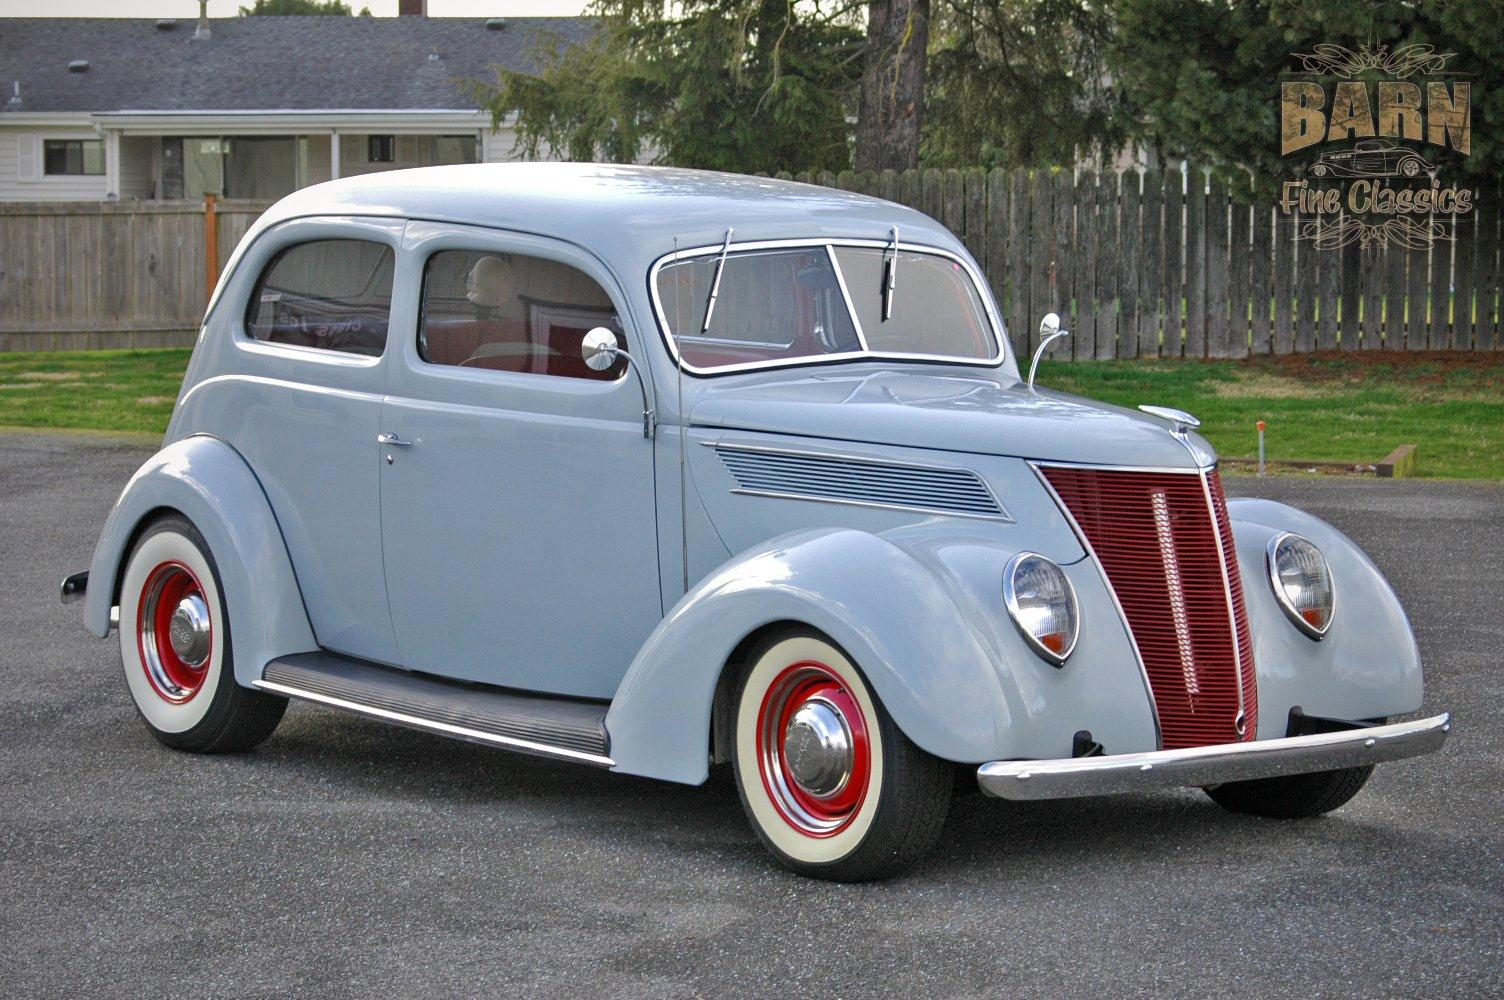 1937 Ford Sedan 2 Door Slantback Hotrod Hot Rod Old School